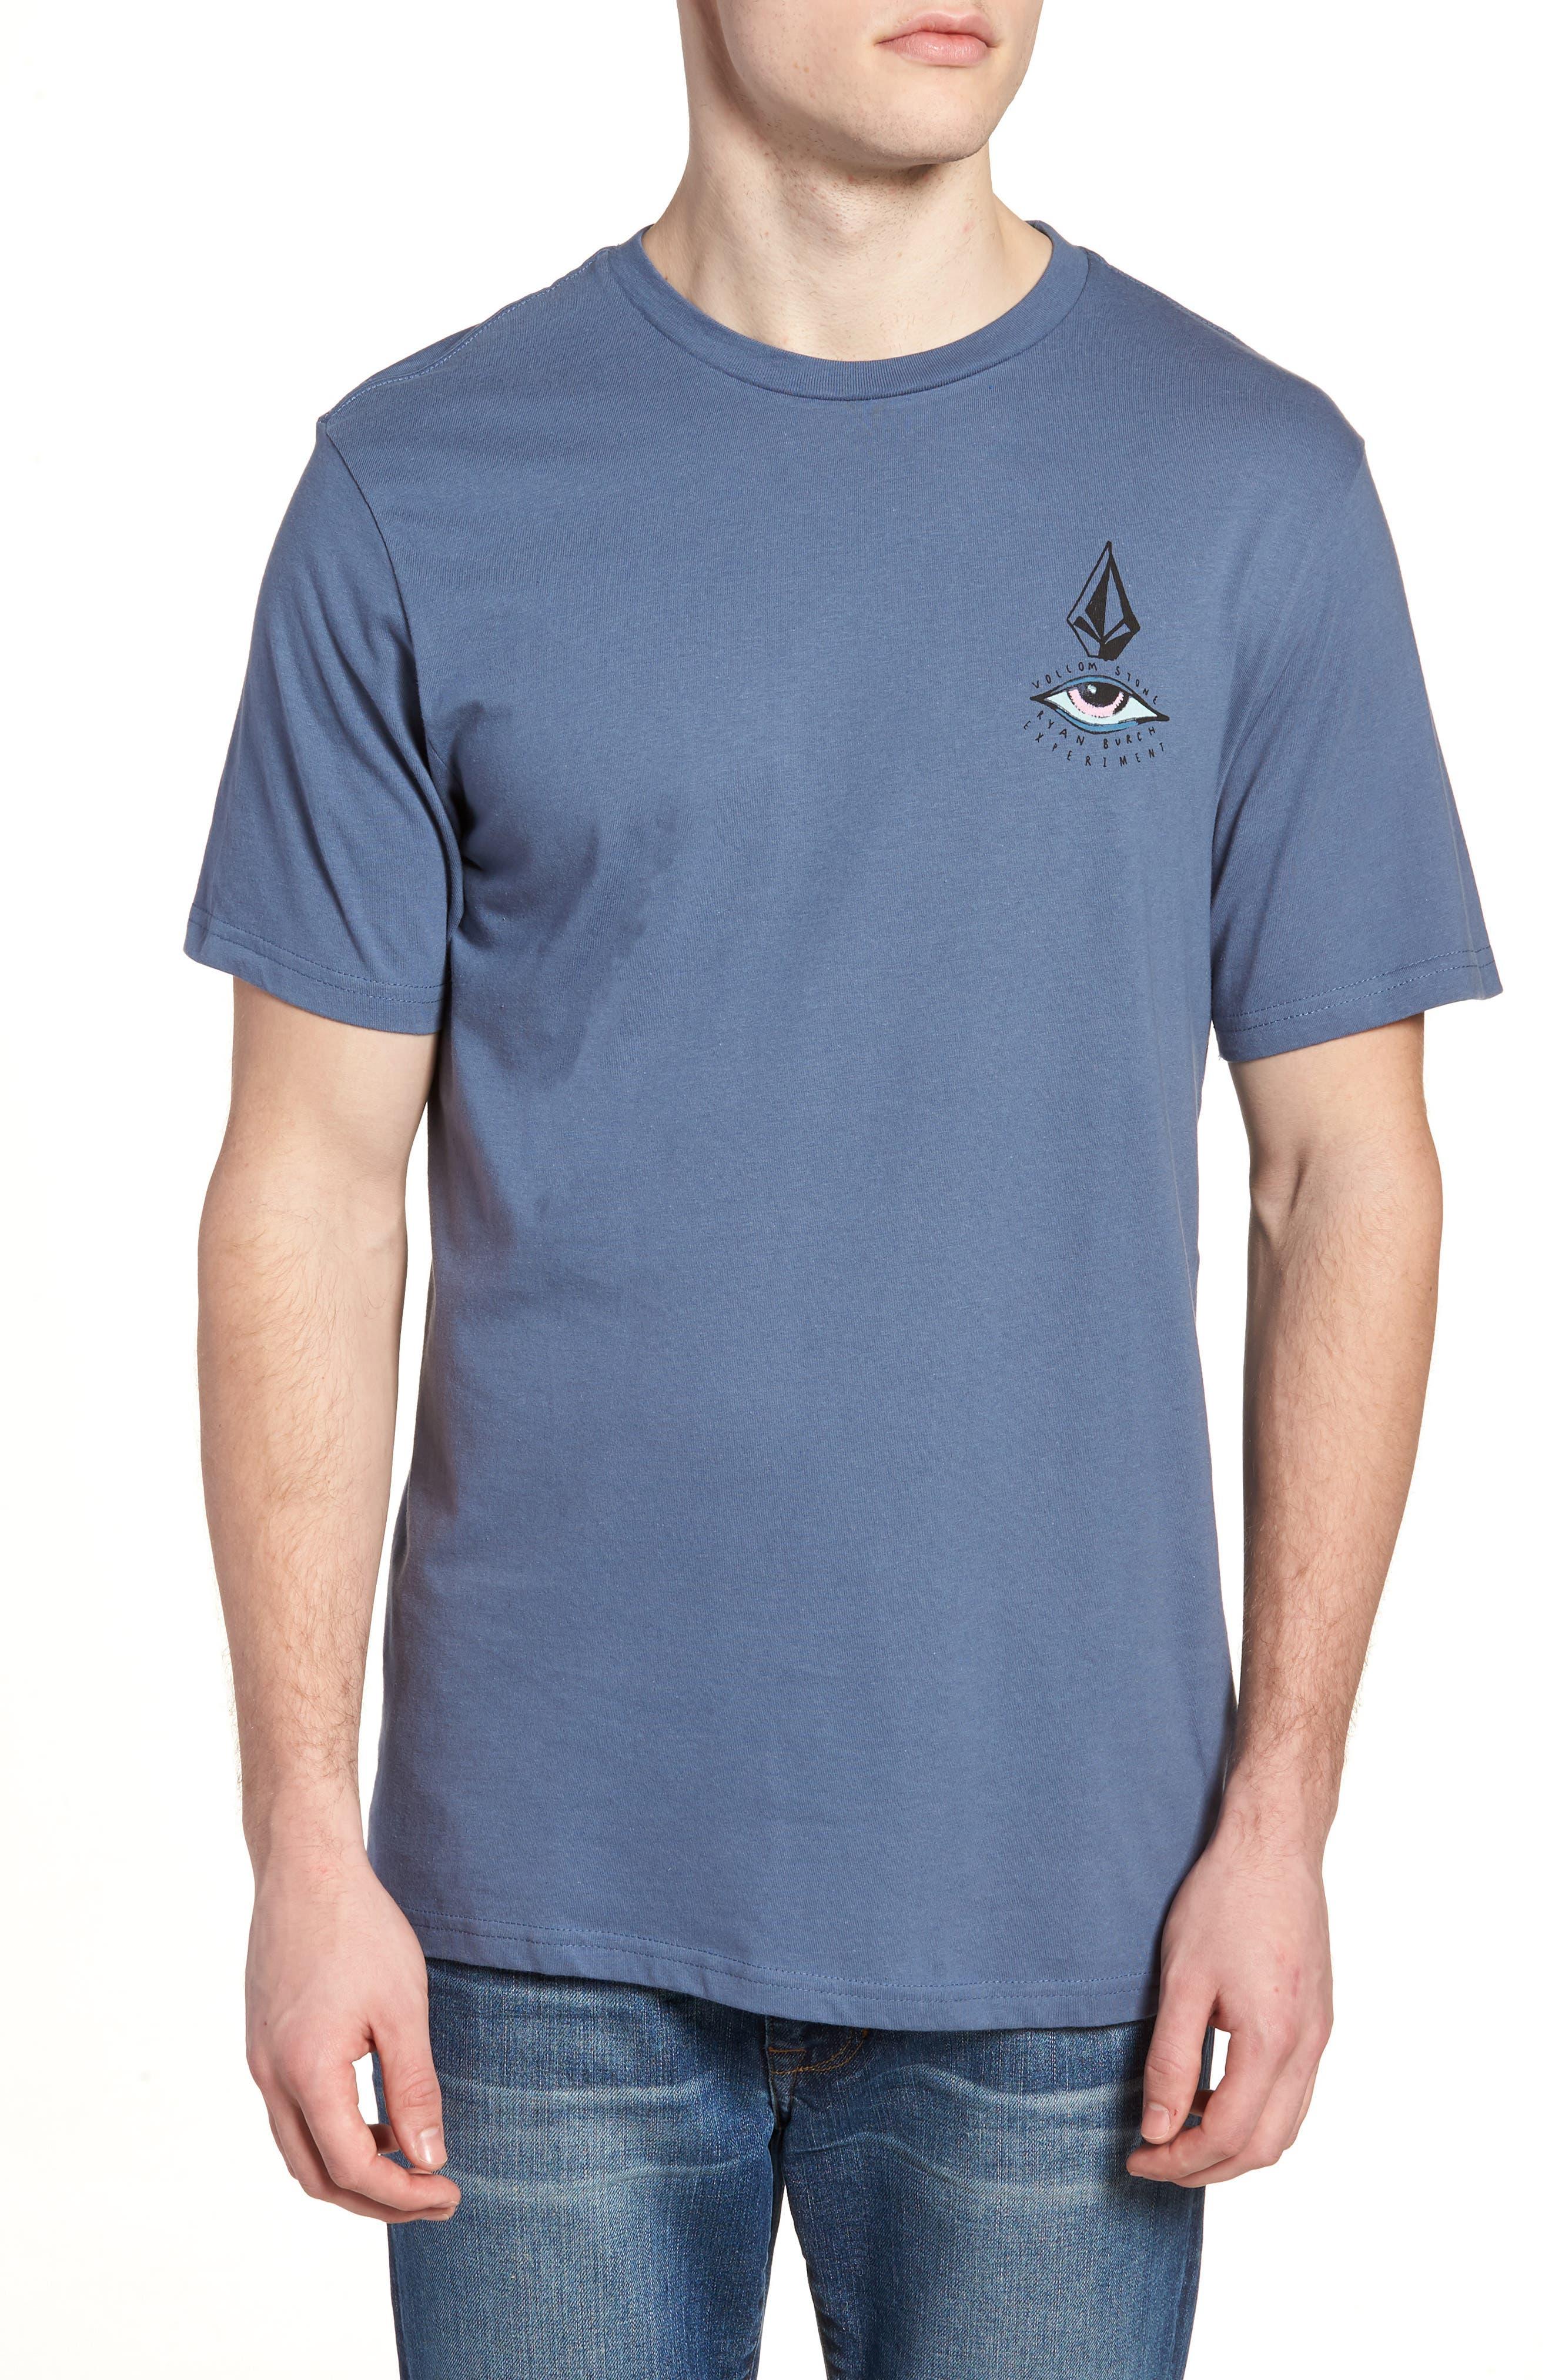 Burch Eye Graphic T-Shirt,                             Main thumbnail 1, color,